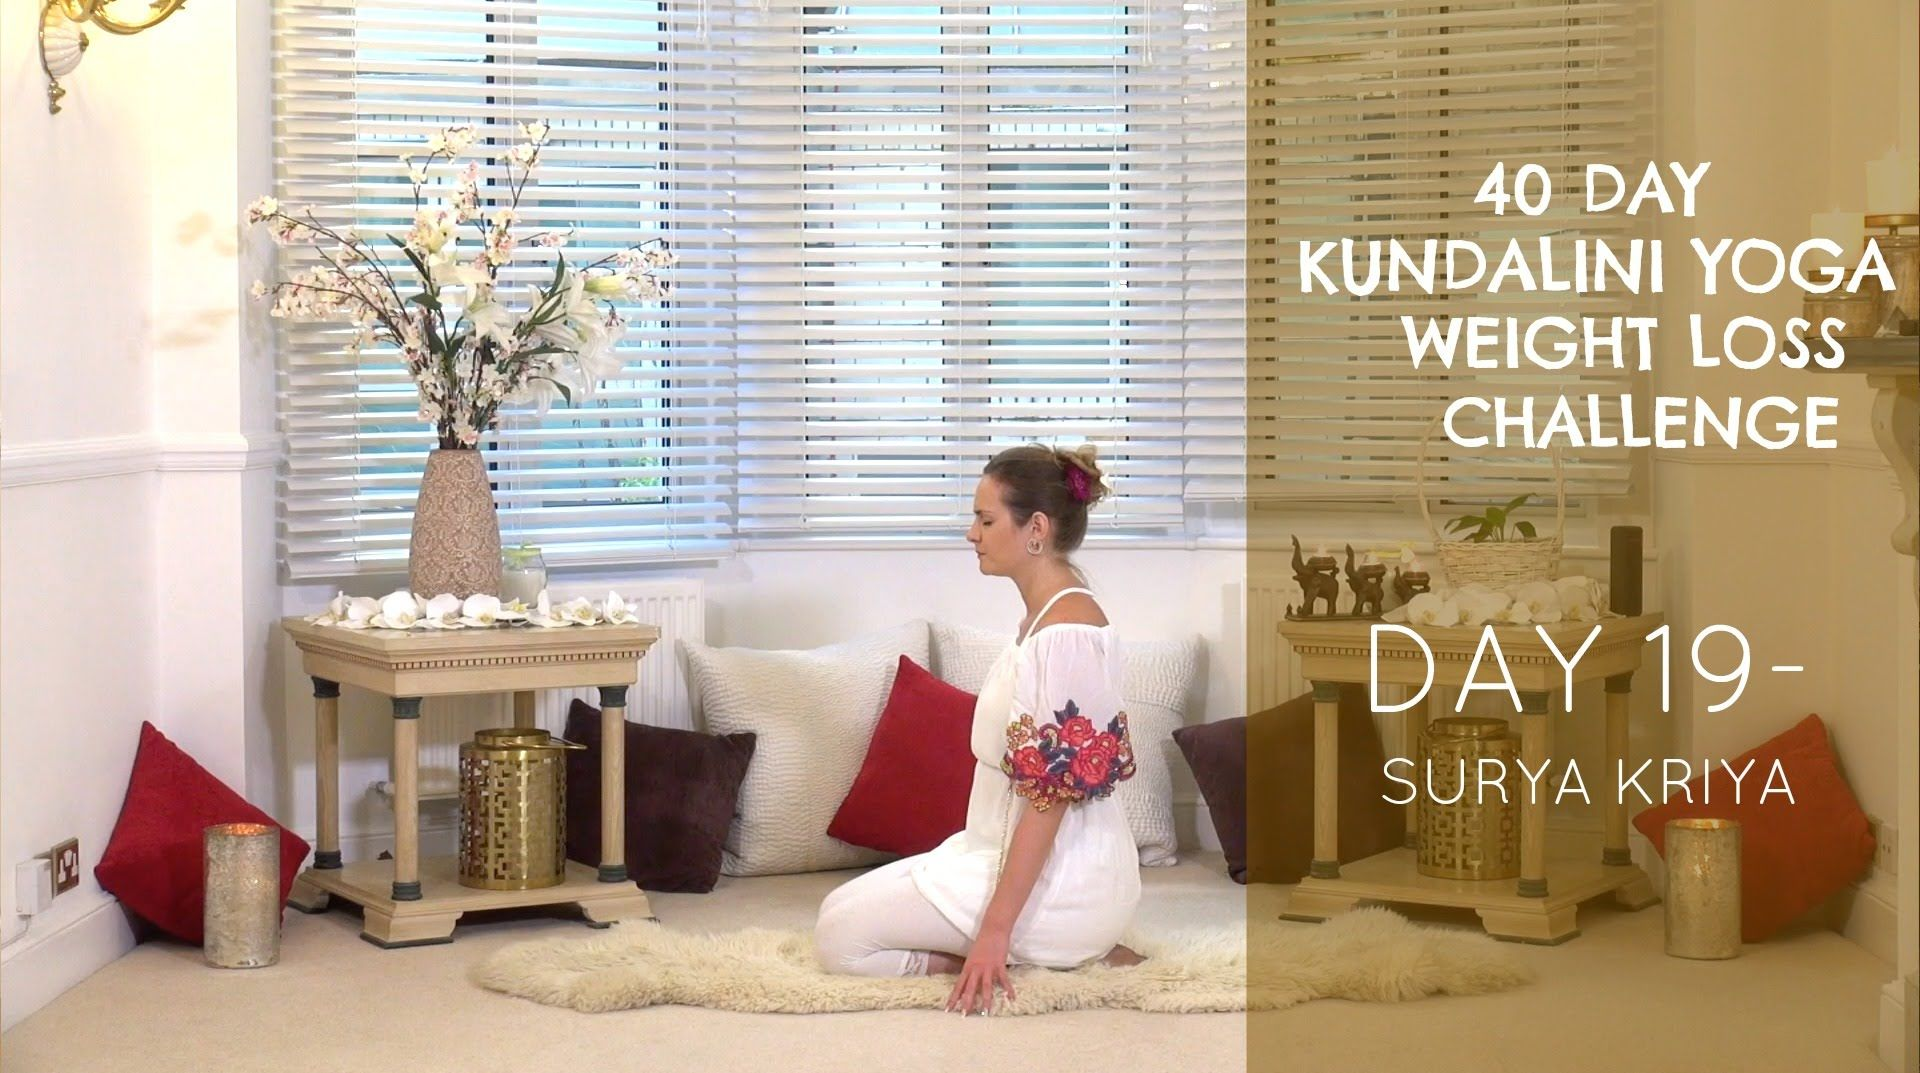 Day 19: Surya Kriya - The 40-Day Day Kundalini Yoga Weight